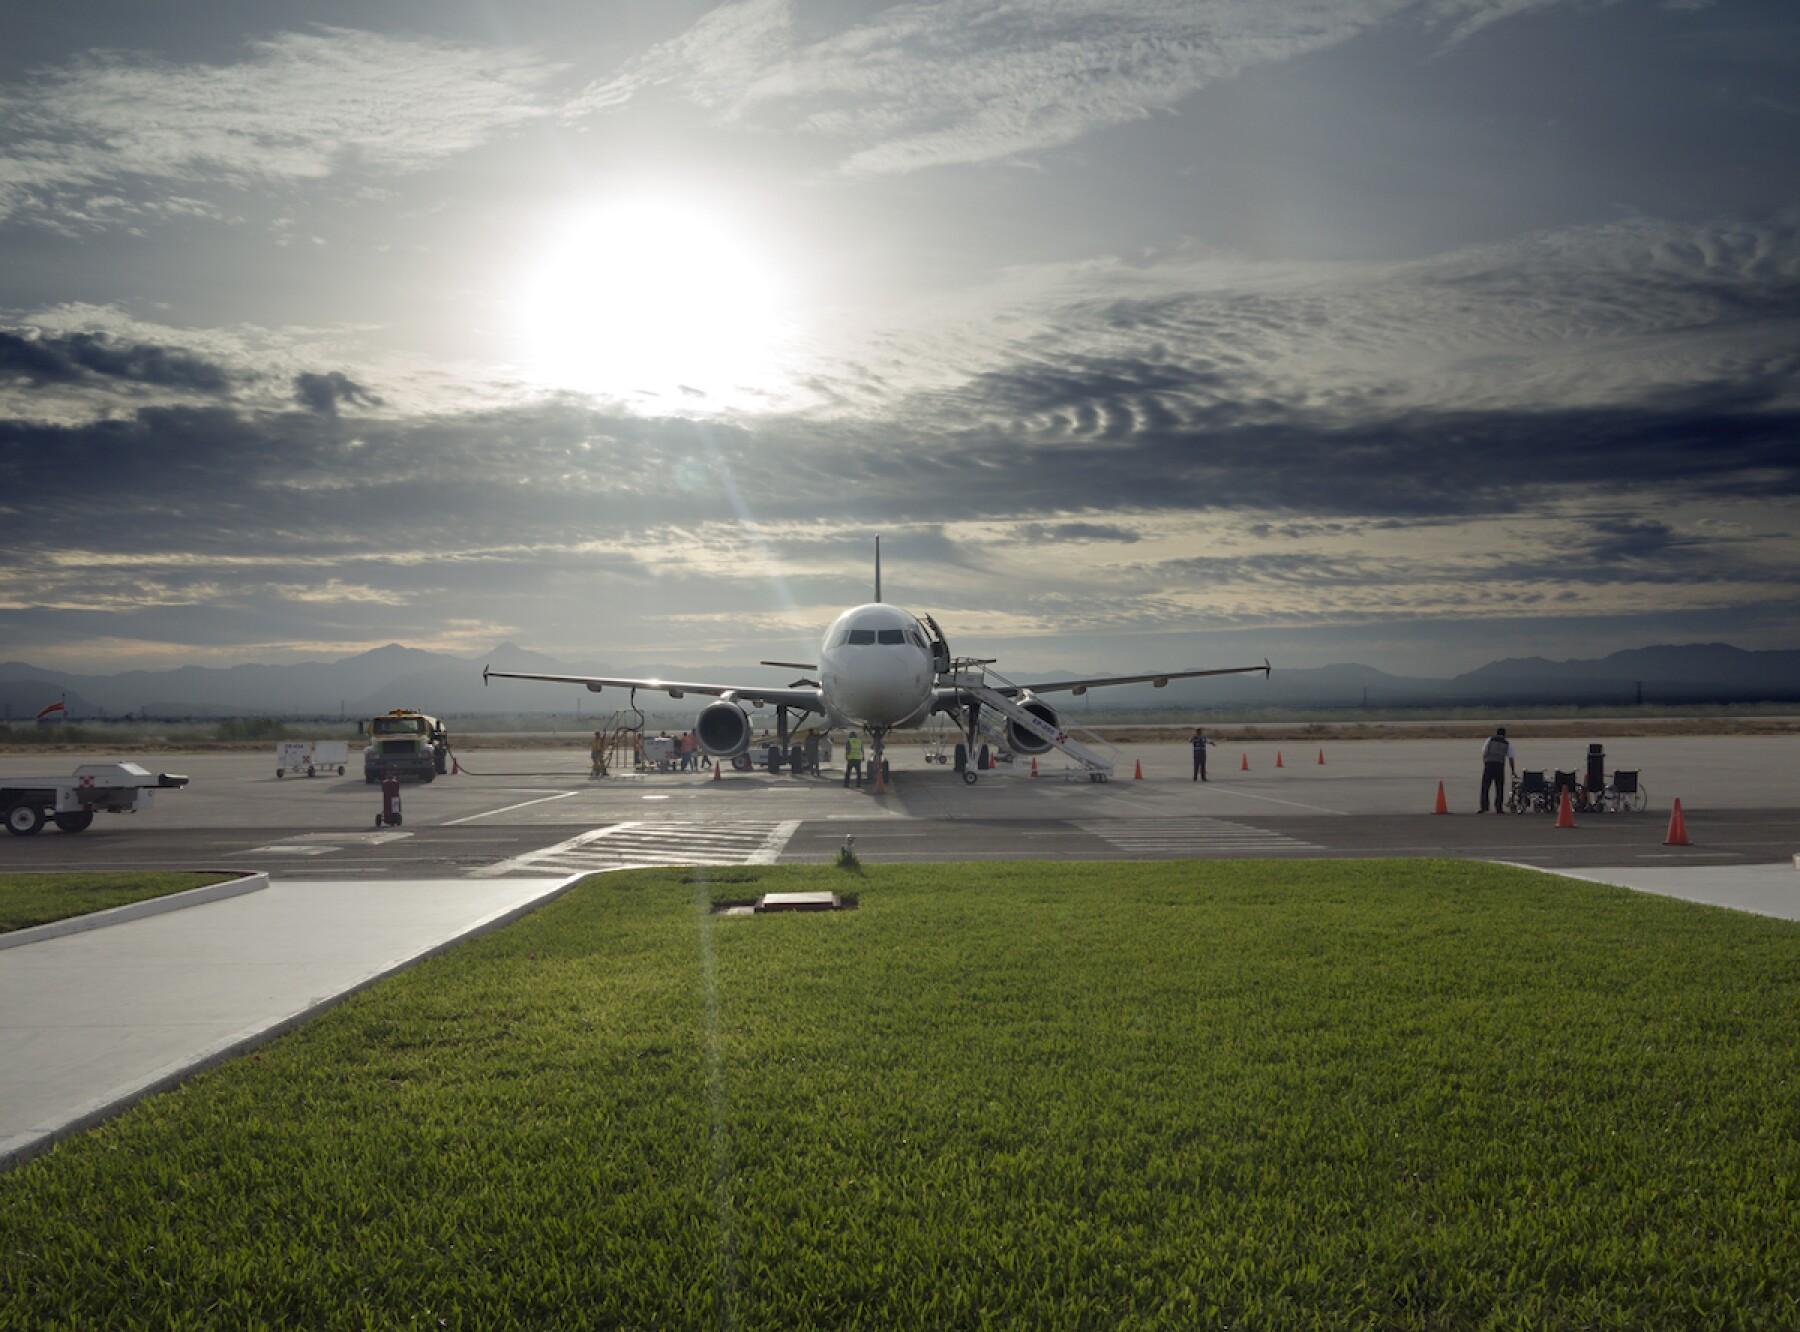 Volaris Airplane, La Paz, Mexico,